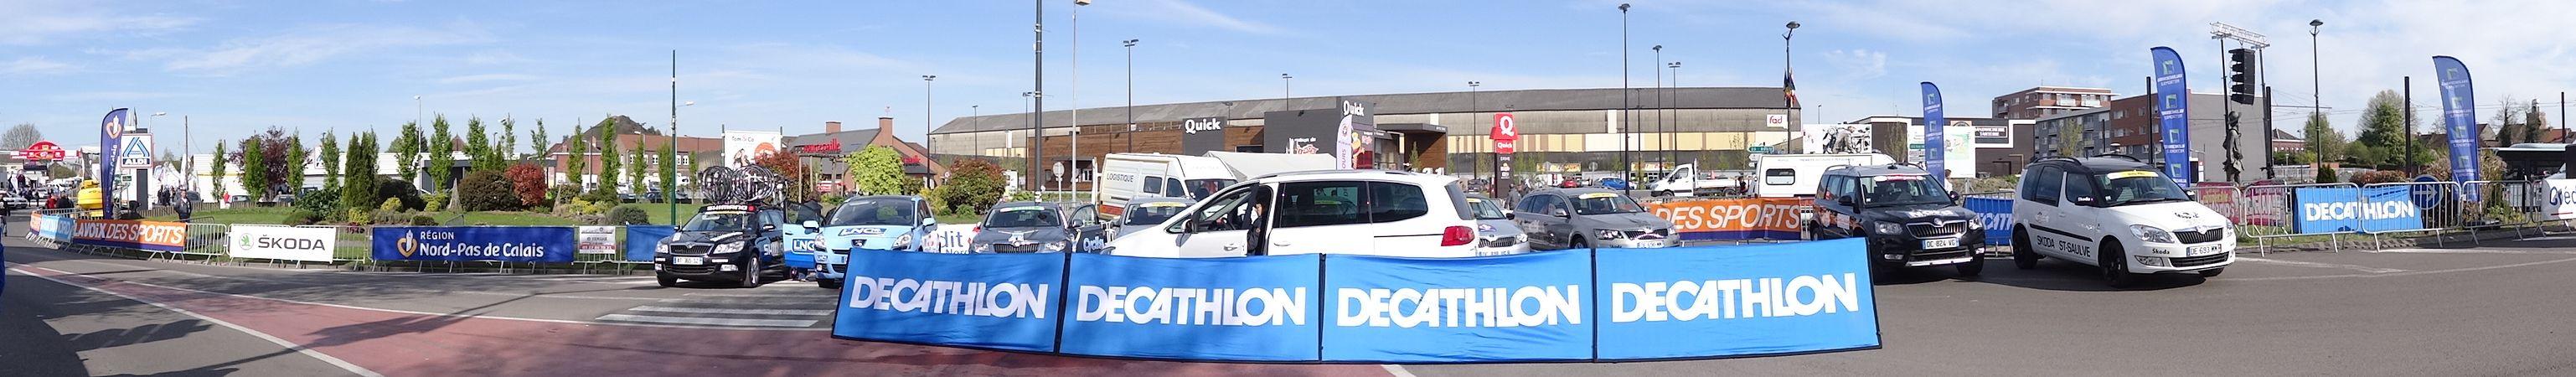 Denain - Grand Prix de Denain, le 17 avril 2014 (A017).JPG